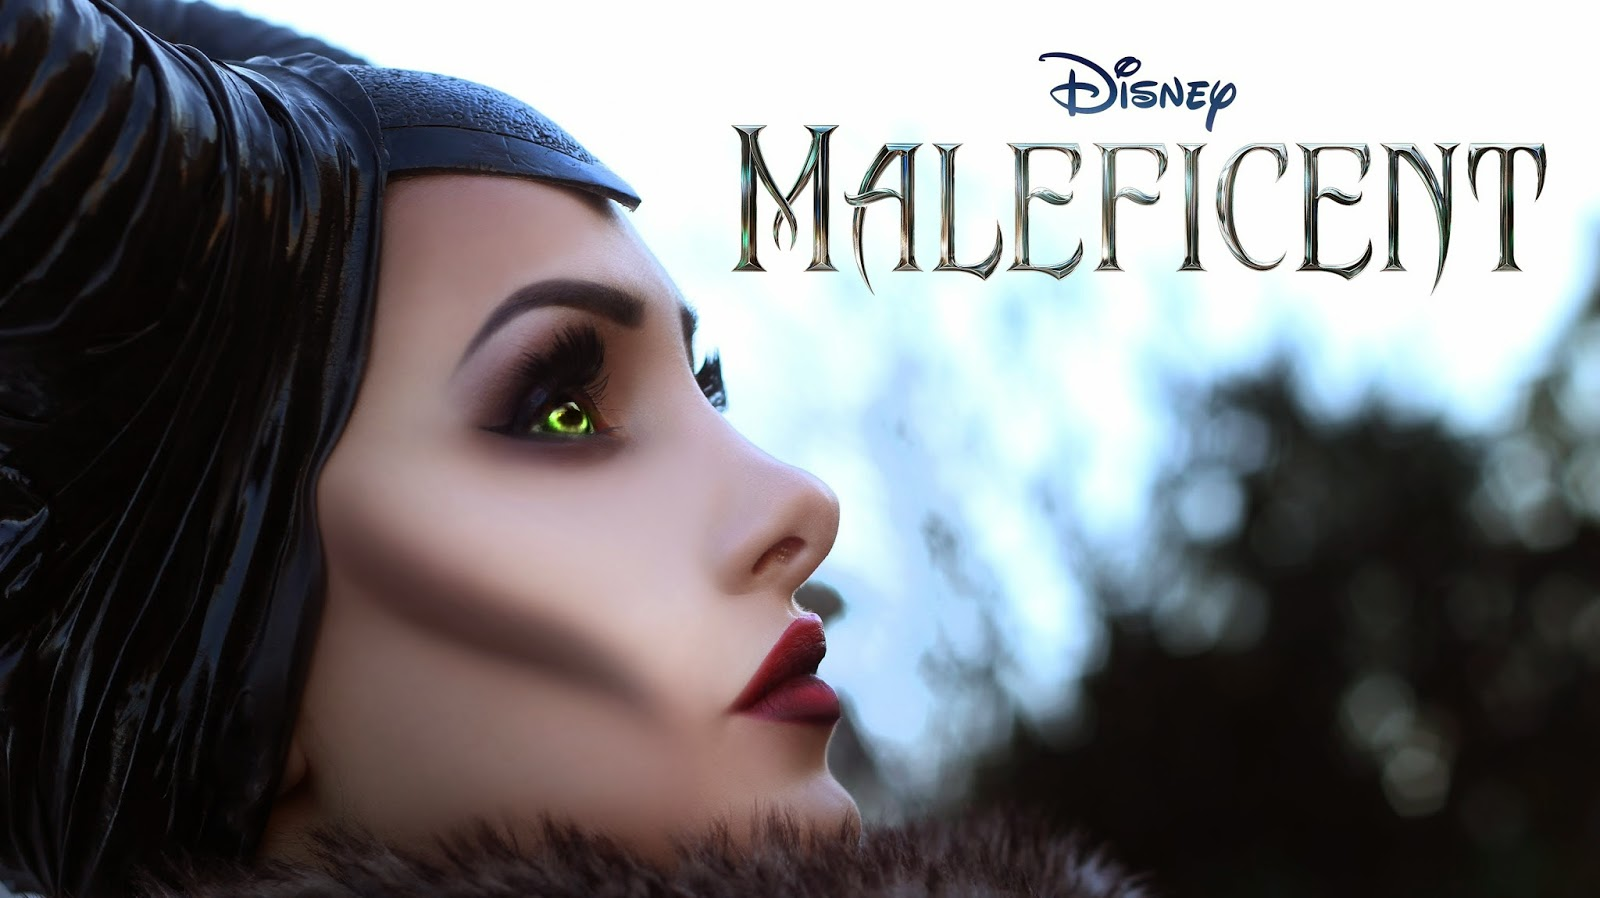 maleficient-angelina-jolie-disney-movie-2014